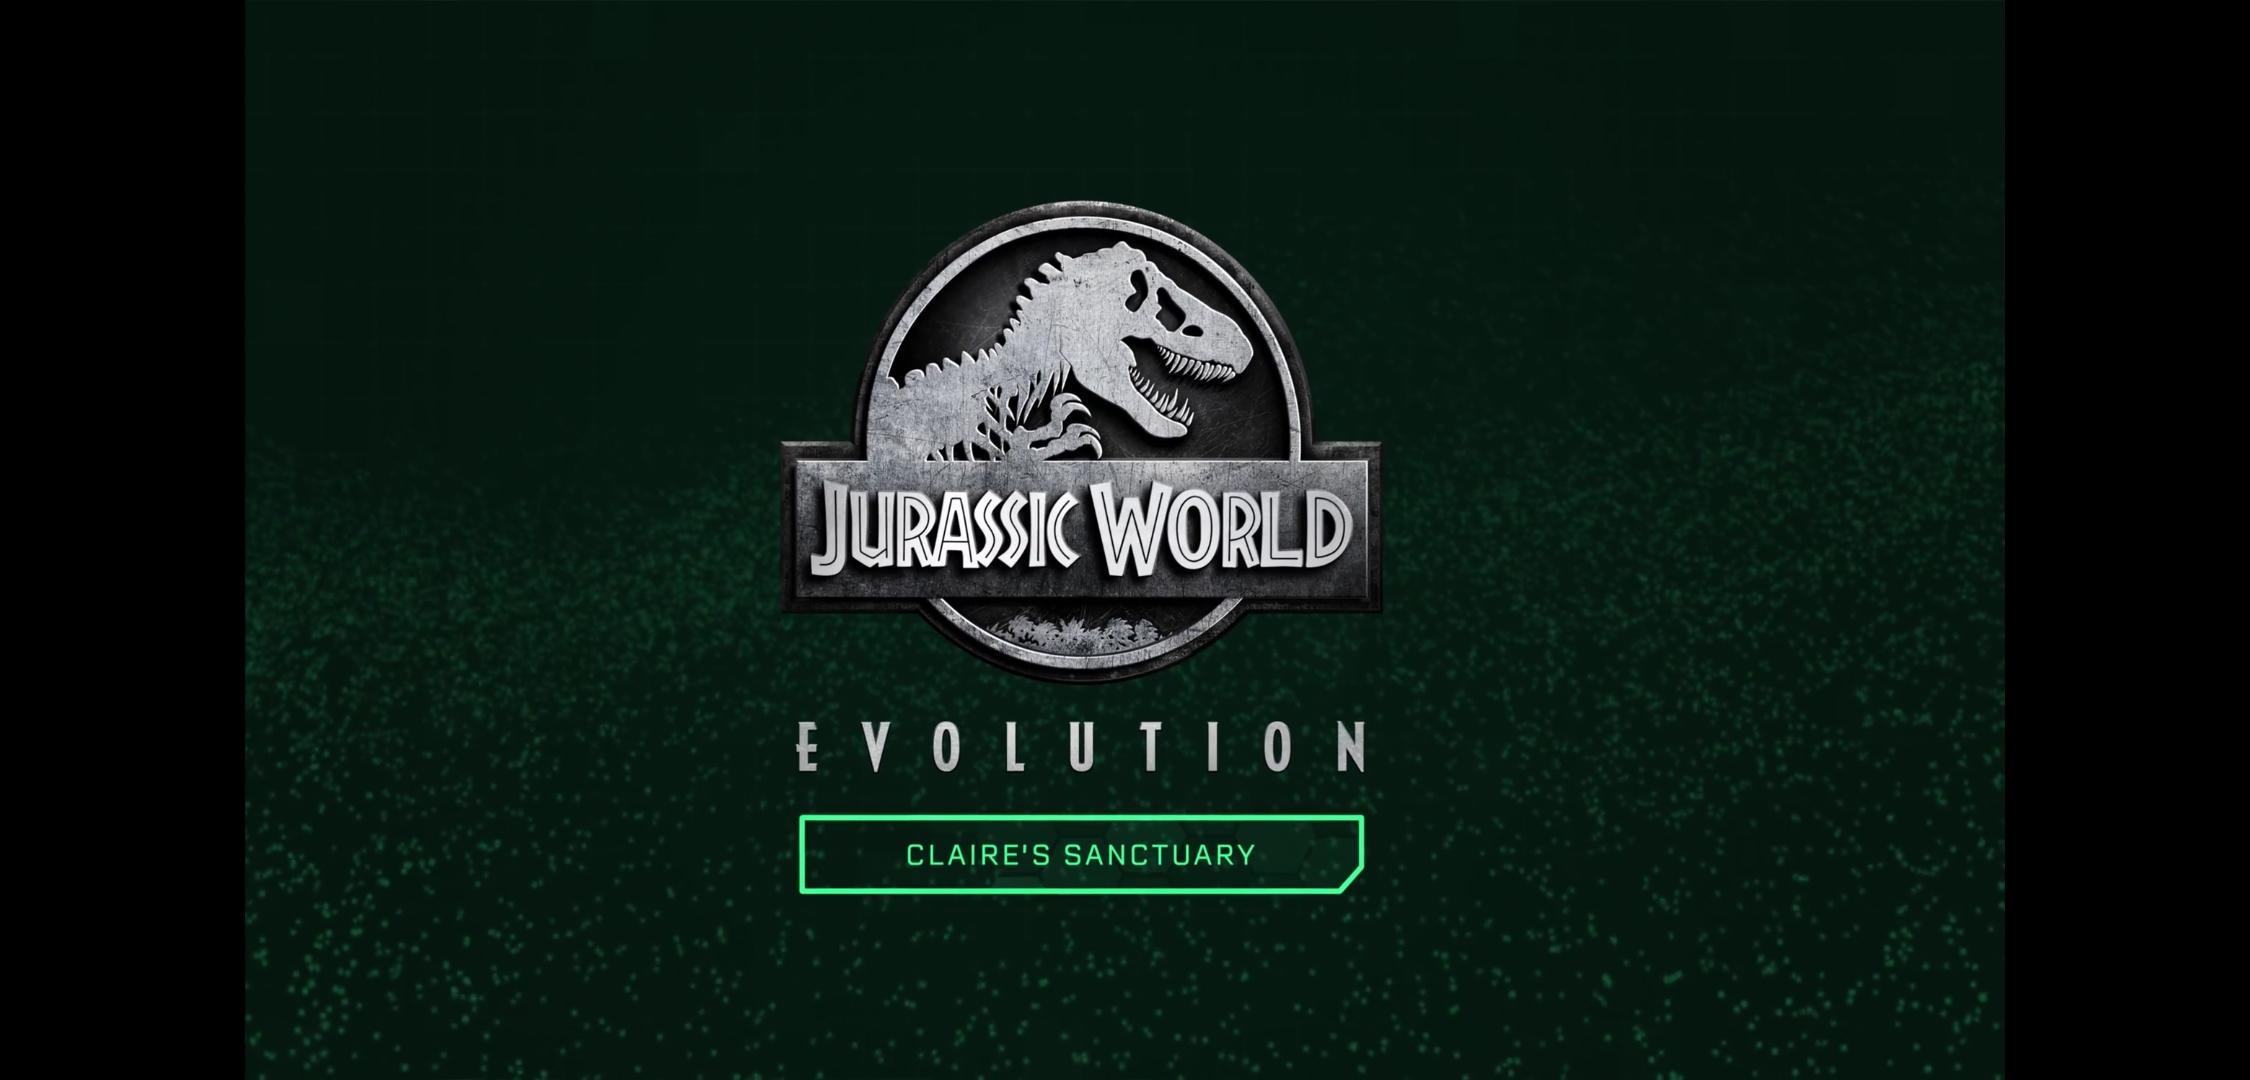 Jurassic World Evolution Claire's Sanctuary logo